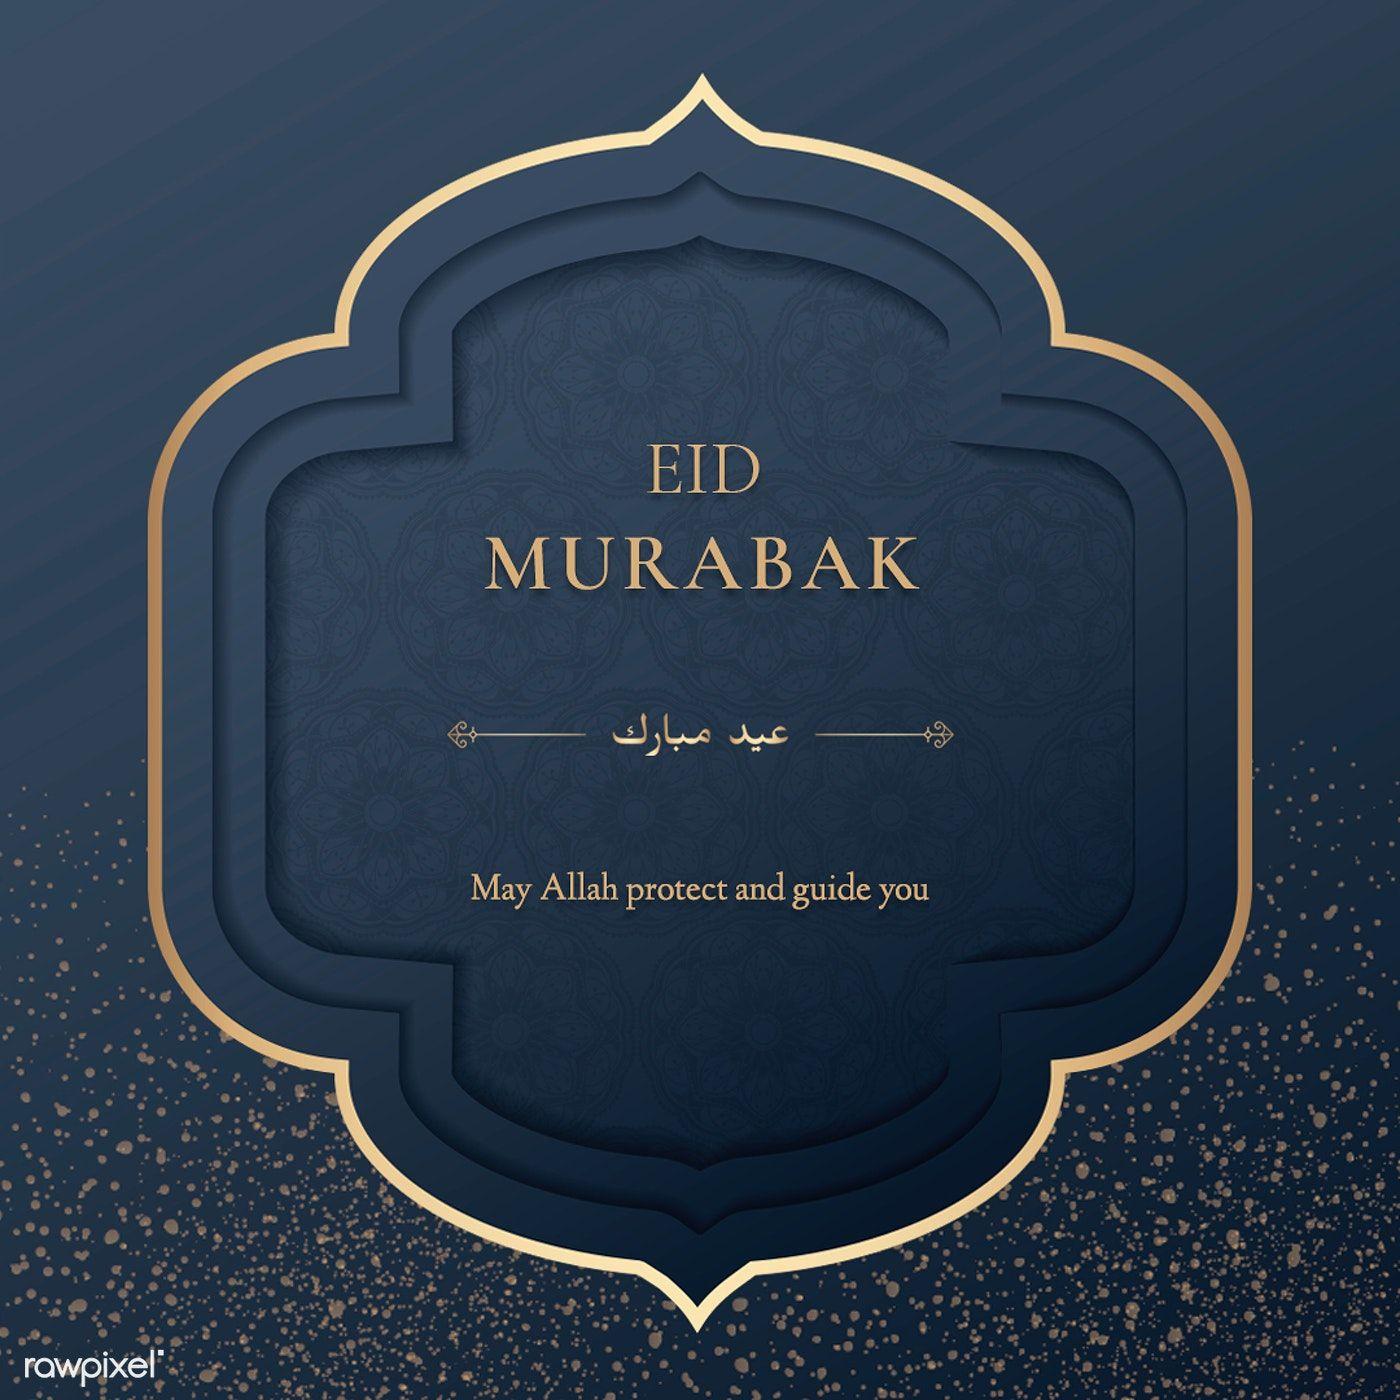 Download Premium Illustration Of Festive Eid Mubarak Greeting Card Eid Mubarak Greeting Cards Eid Greetings Eid Mubarak Greetings